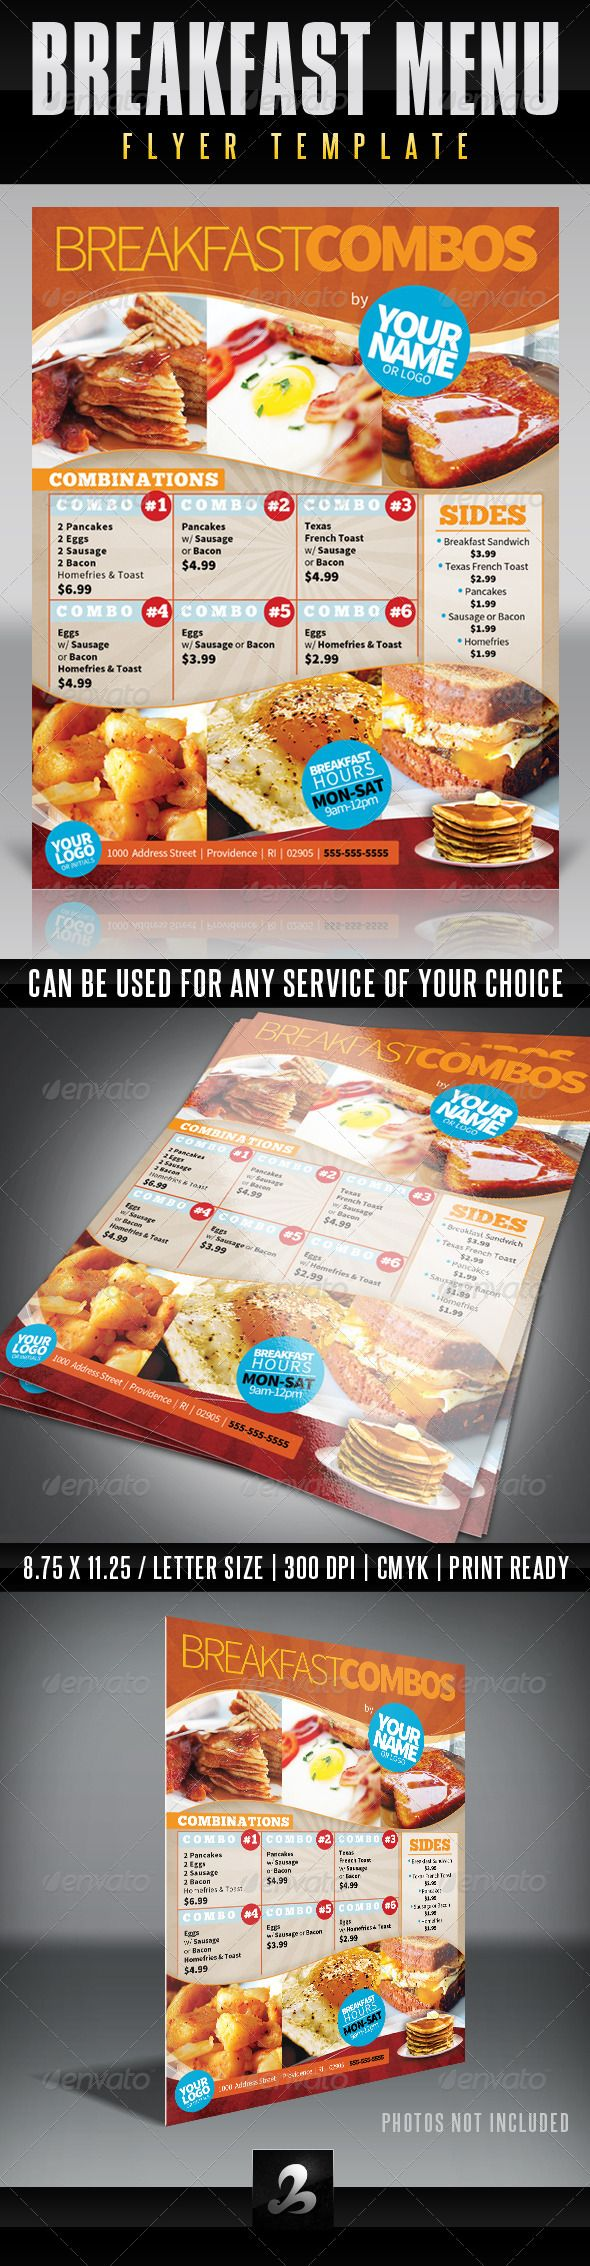 Menu Flyer Template Breakfast – Menu Flyer Template